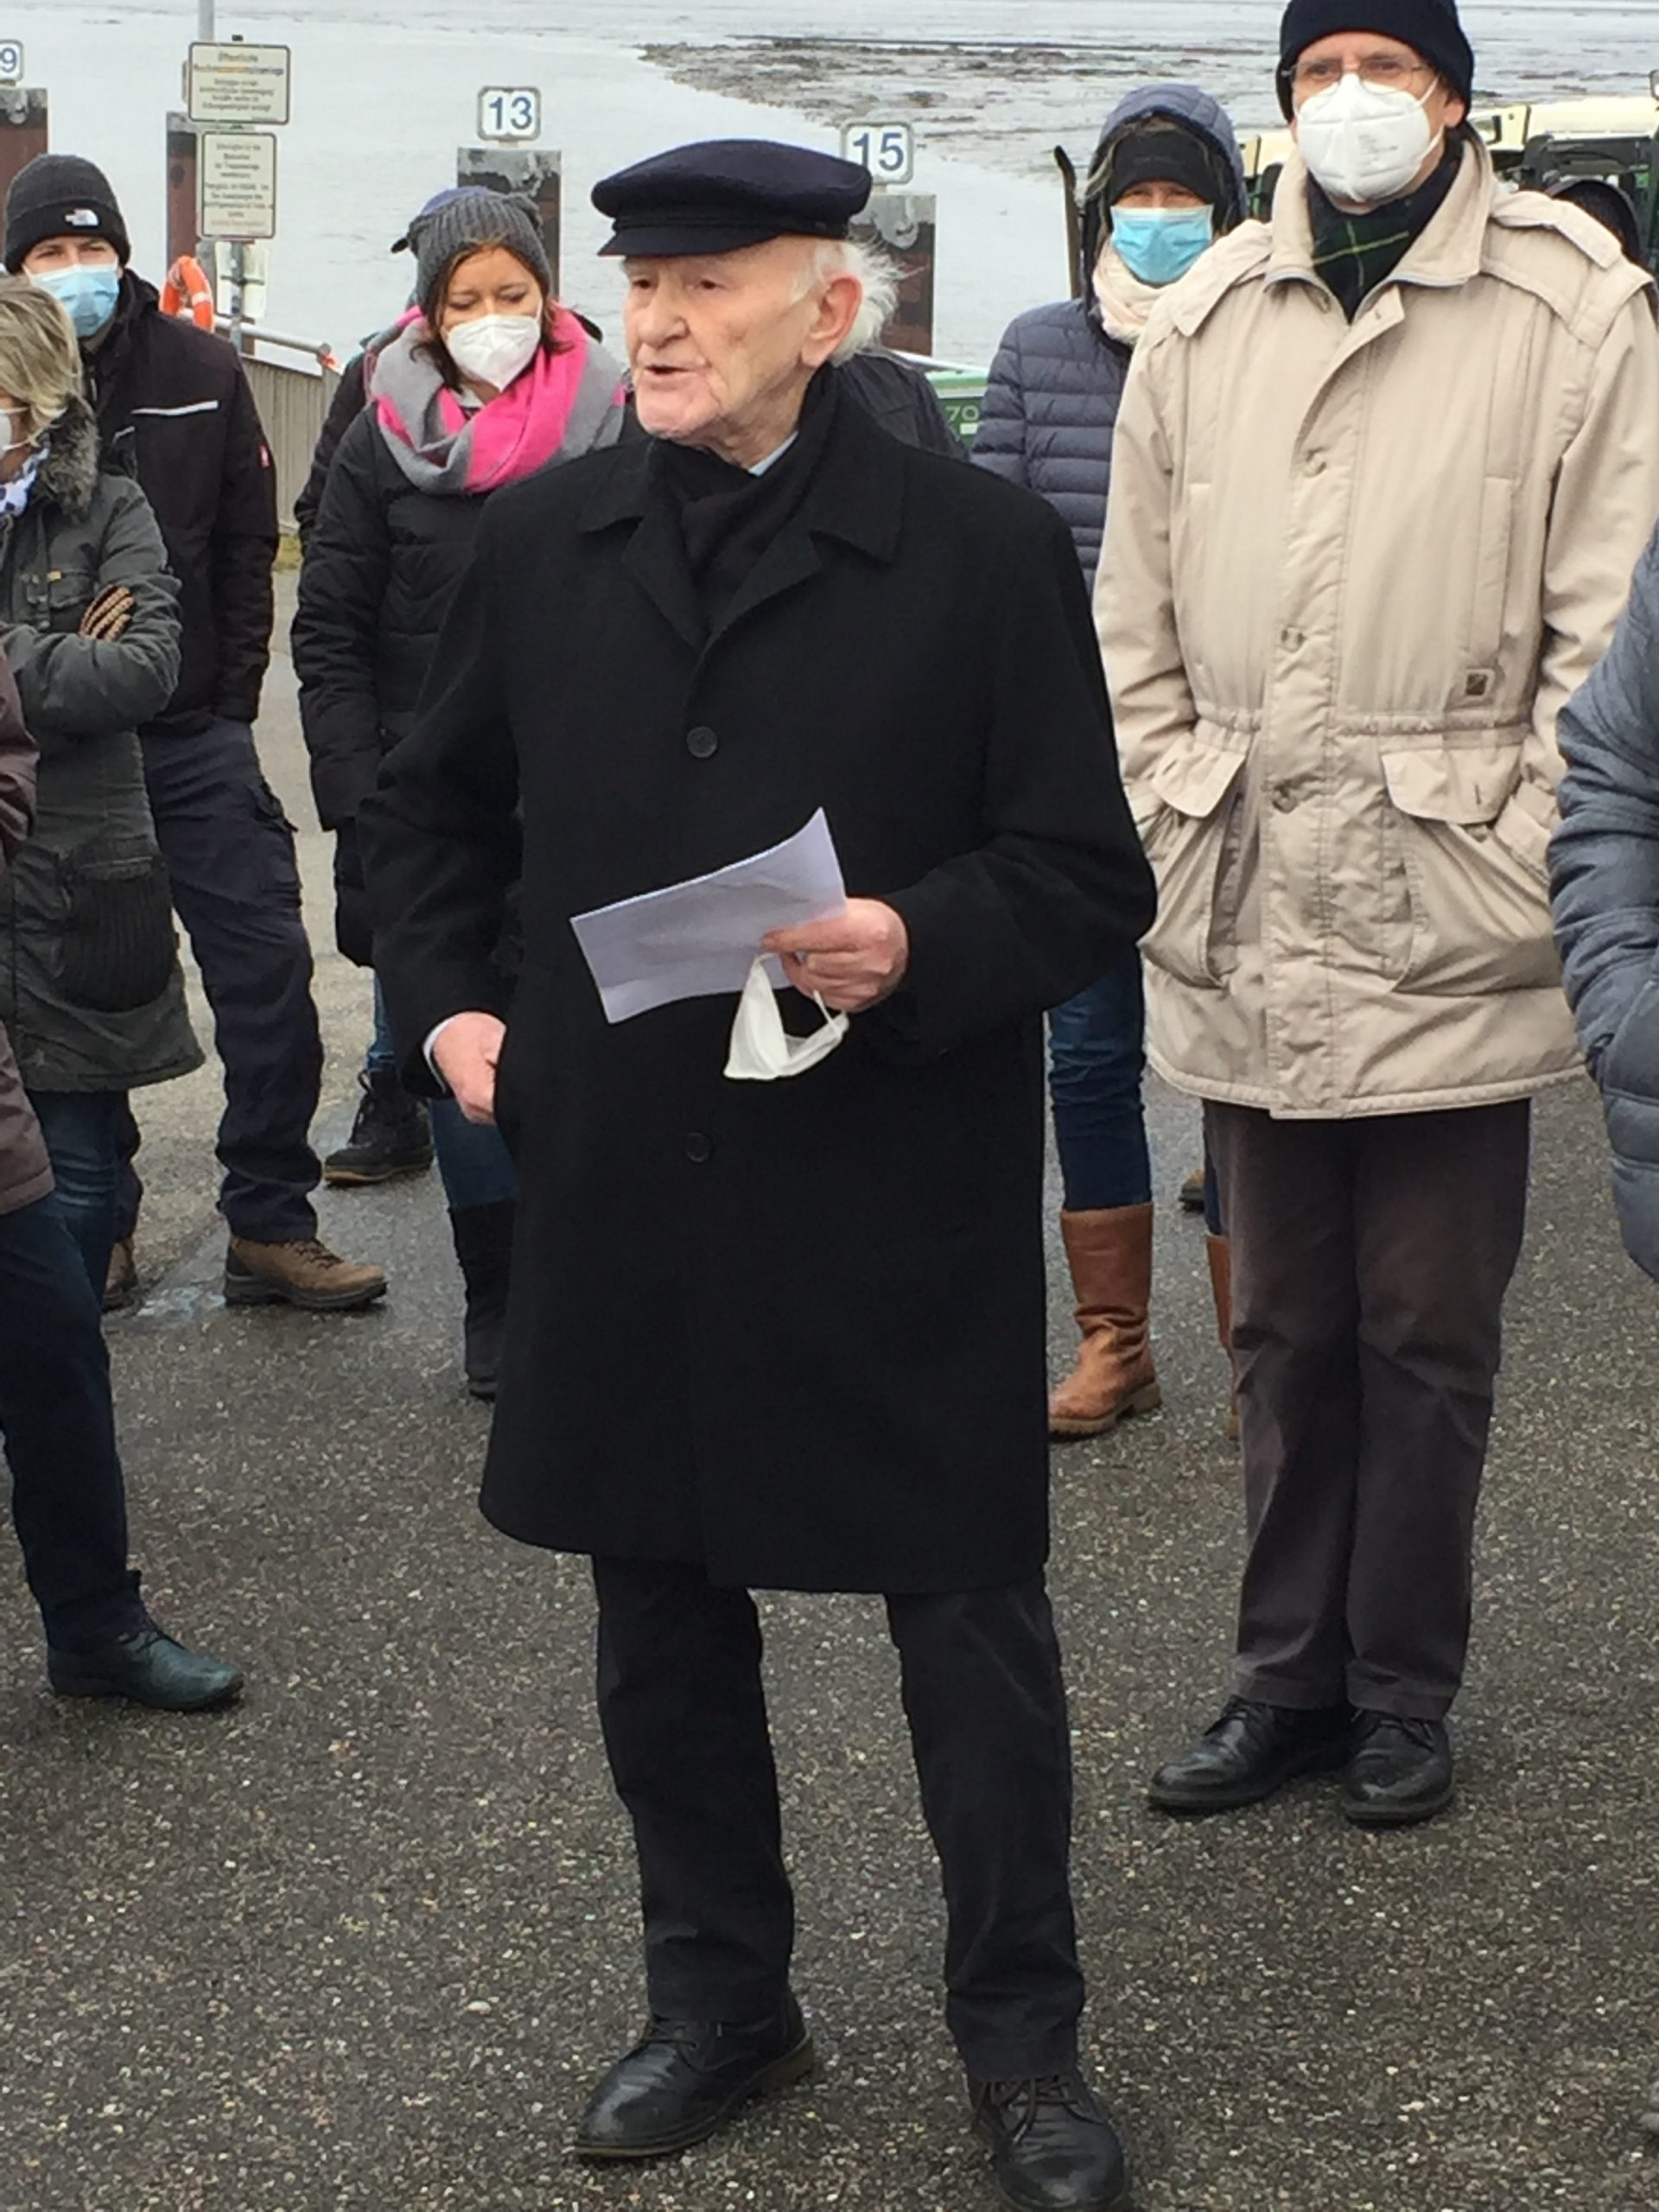 mk -Der Sprecher der Bürgervertretung Neuenfelde-Cranz-Francop Manfred Hoffmann wandte sich angesicht der Sorgen der Bürger an HPA.